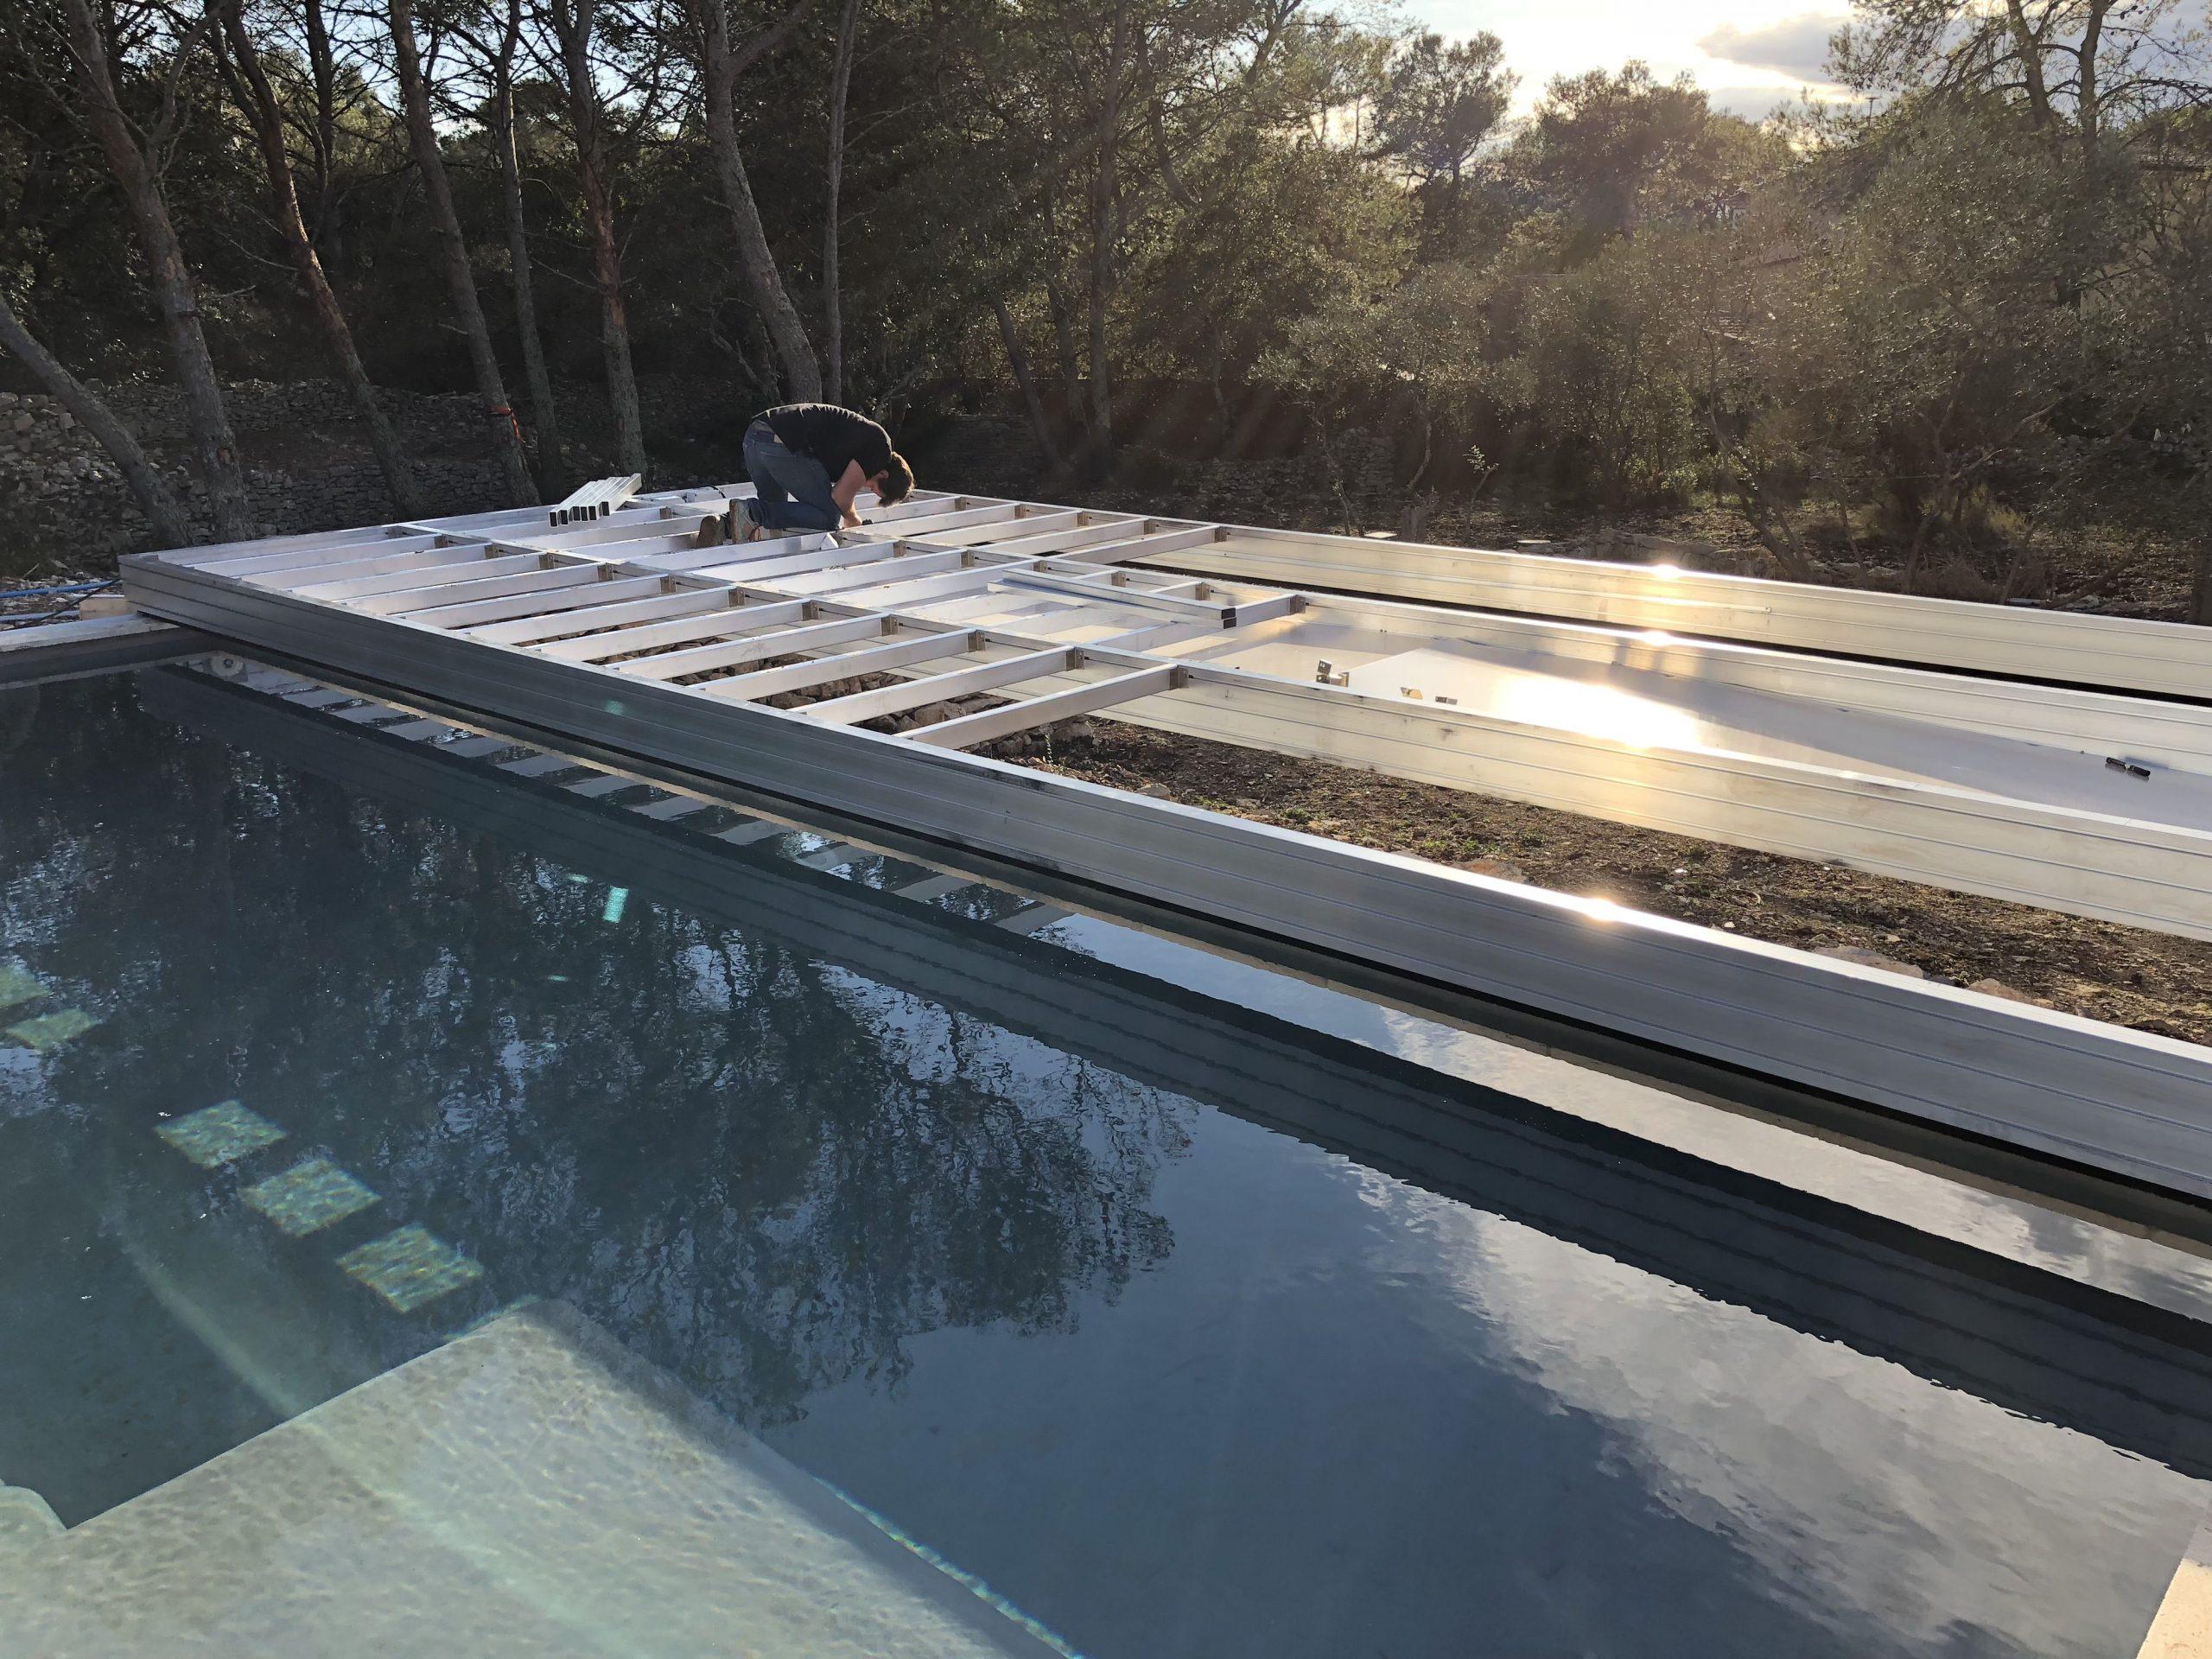 Installation D'une Terrasse Mobile À Nimes | Terrasse Mobile ... pour Fabriquer Une Terrasse Mobile Pour Piscine